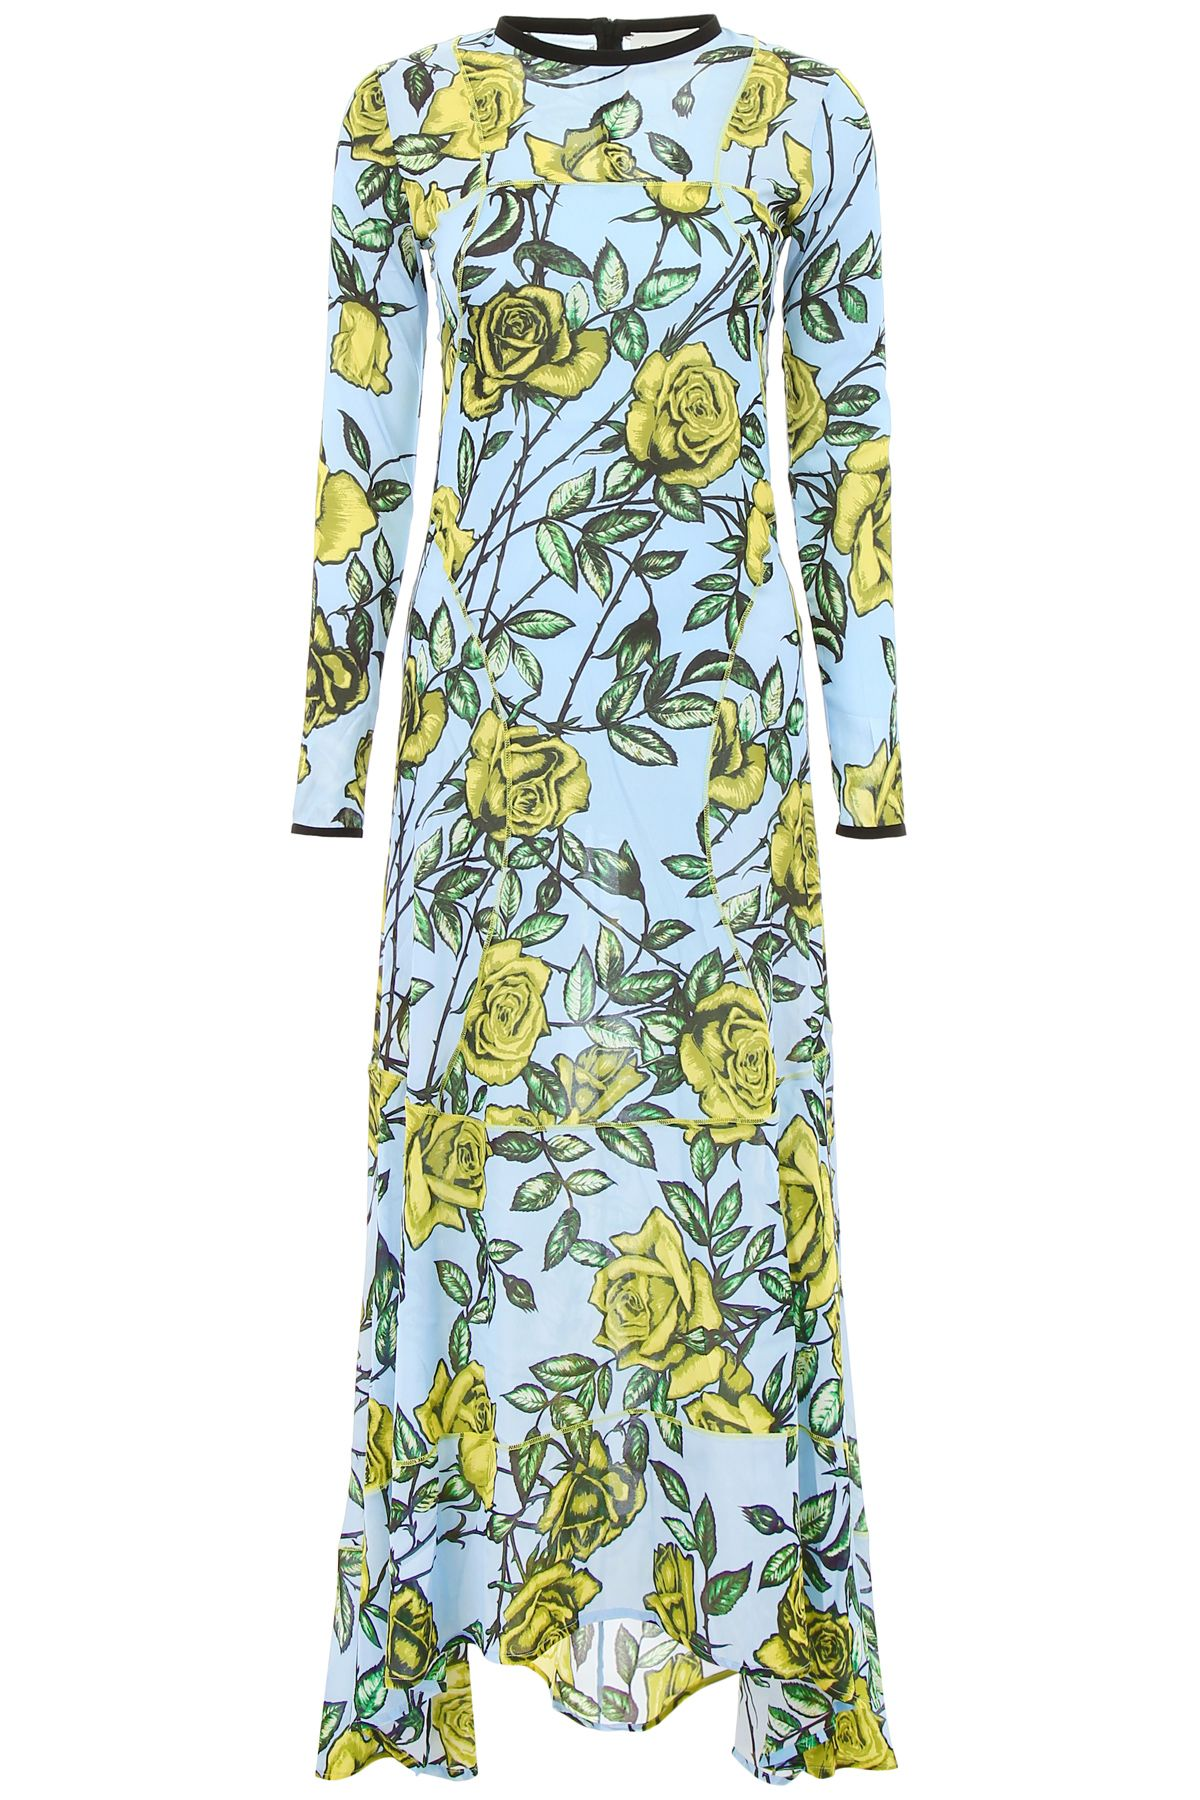 SCRAMBLED EGO Long Dress With Roses in Light Blue Lemon